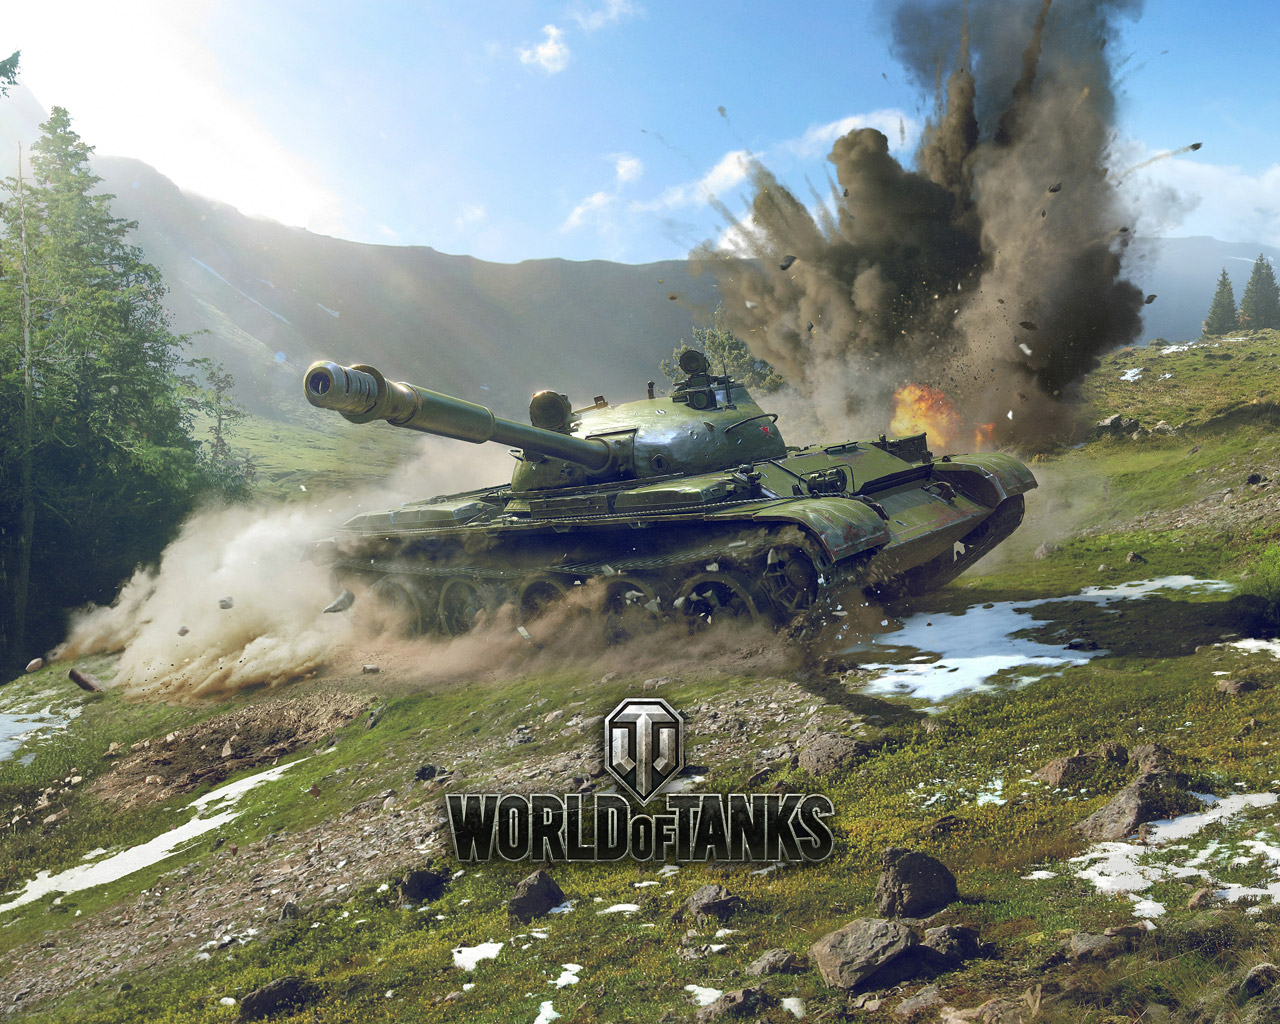 Free World of Tanks Wallpaper in 1280x1024